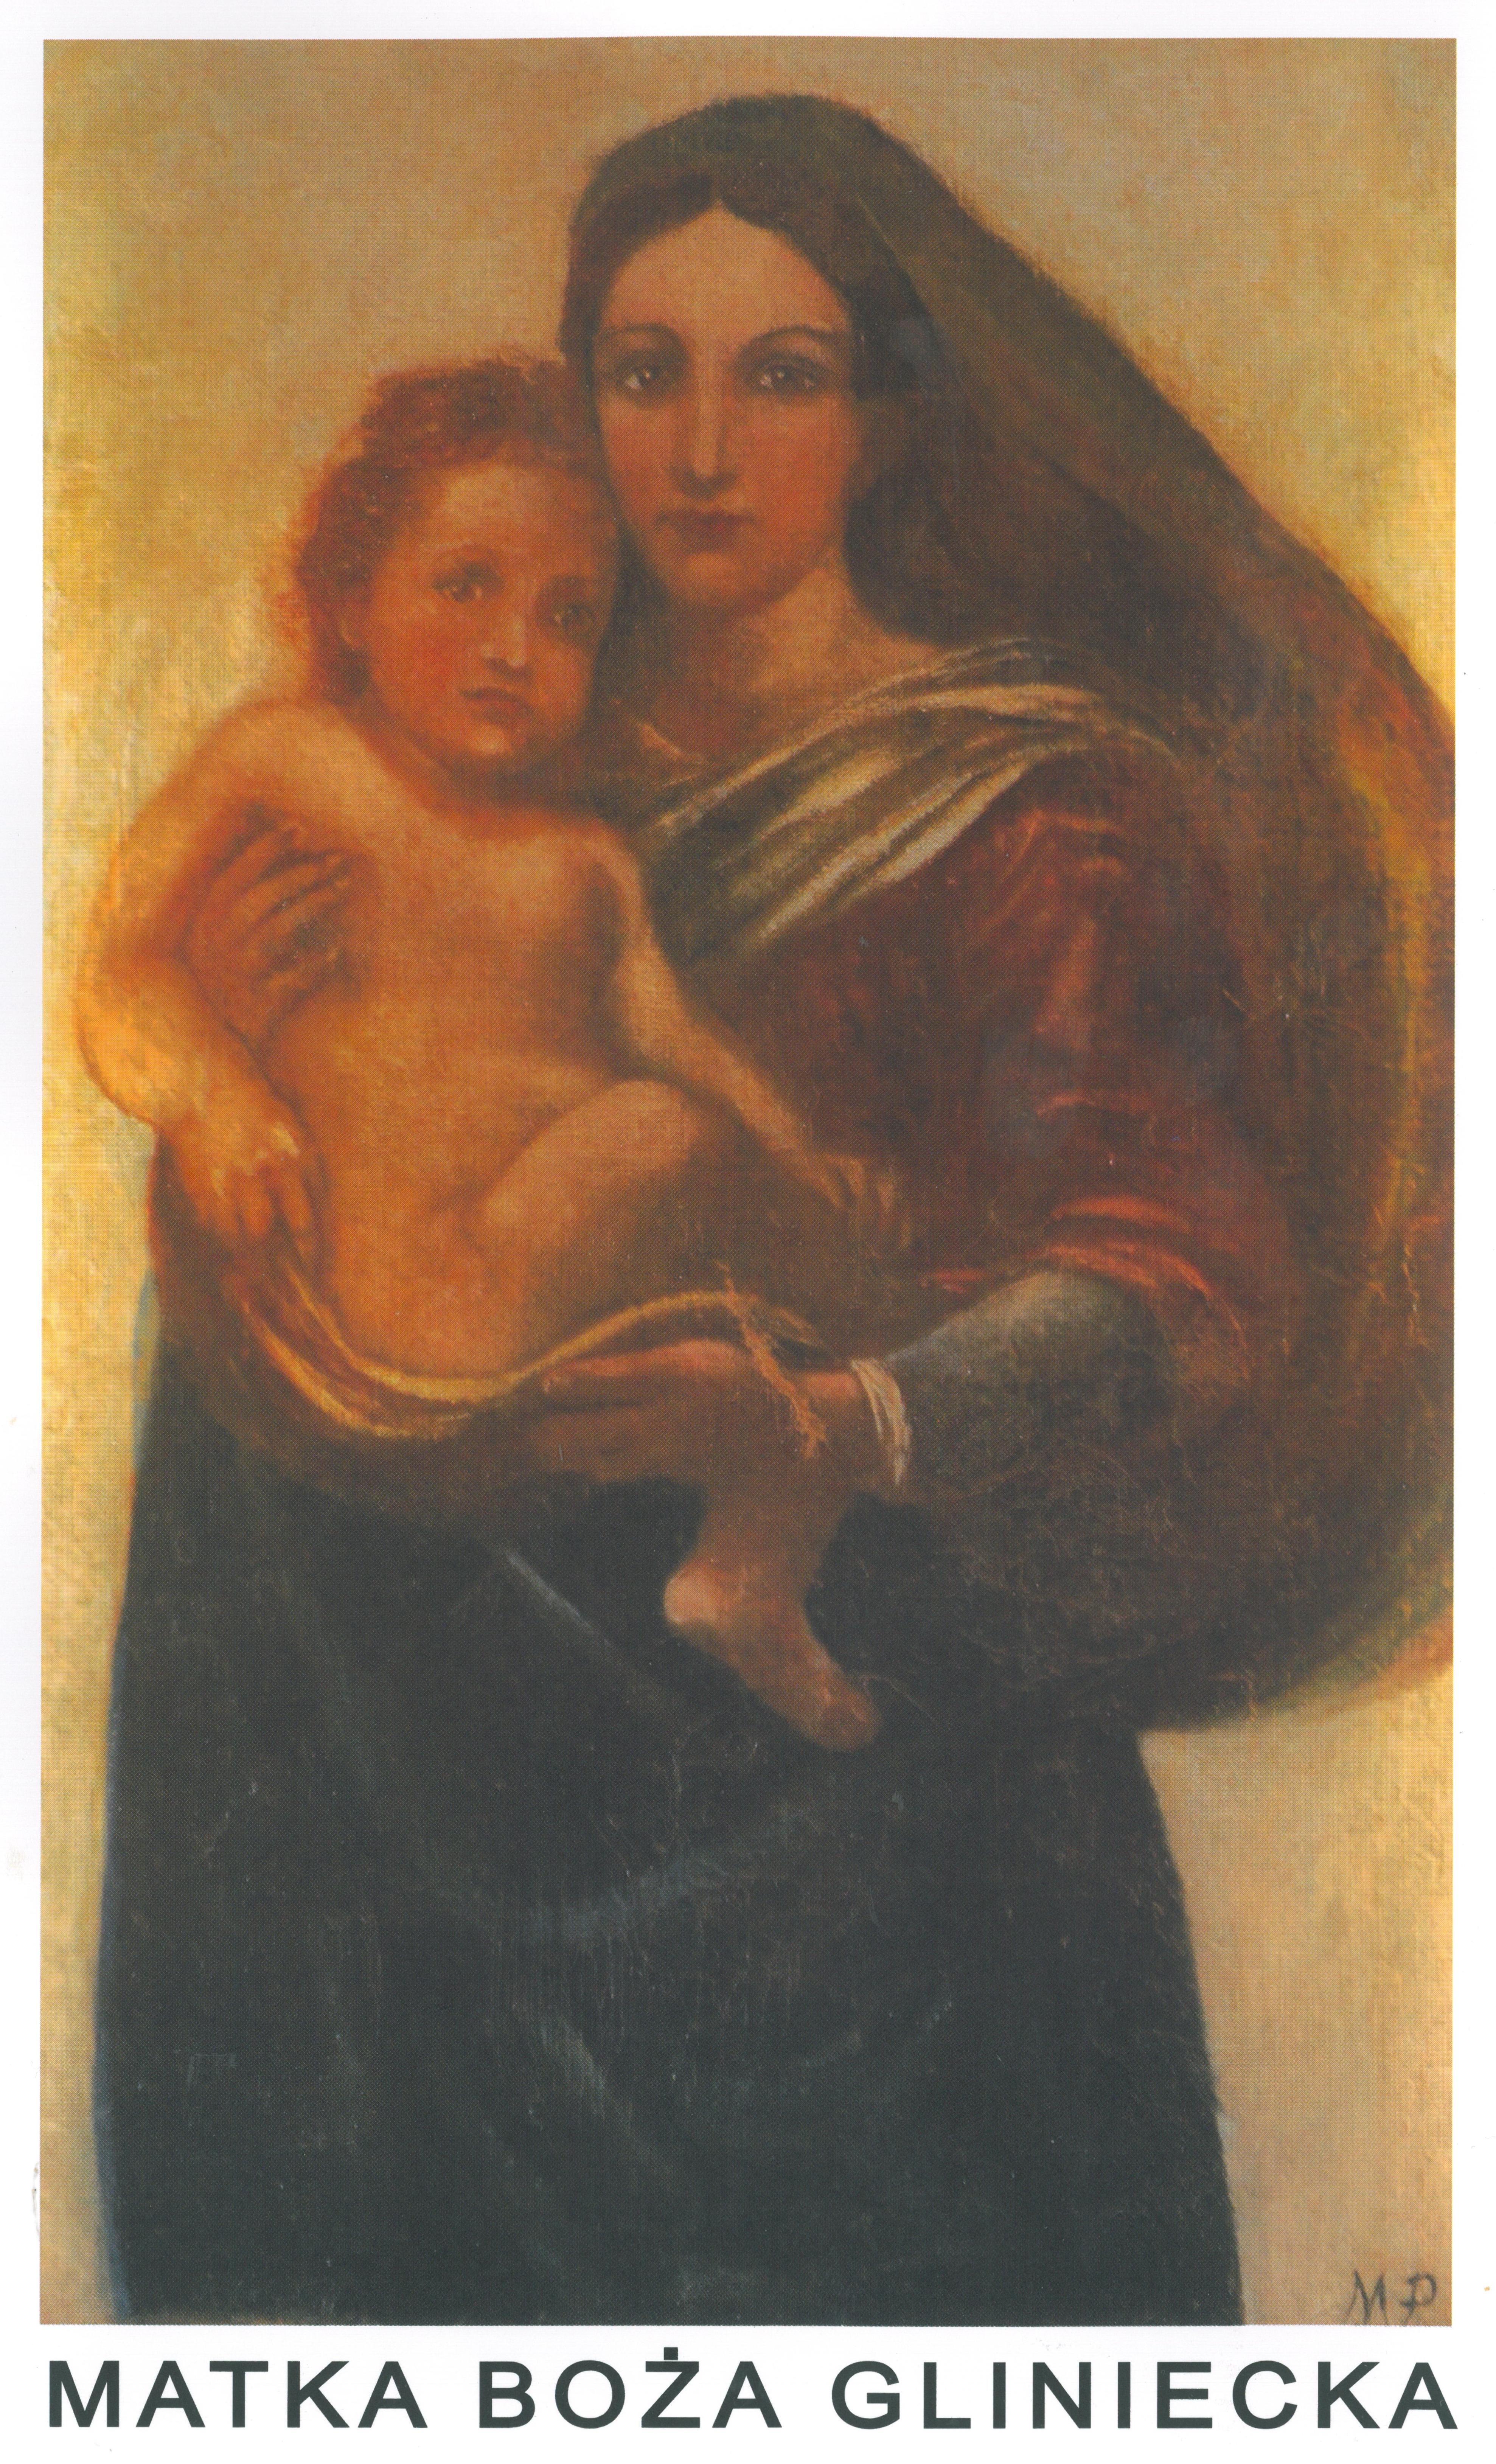 MatkaBozaGliniecka